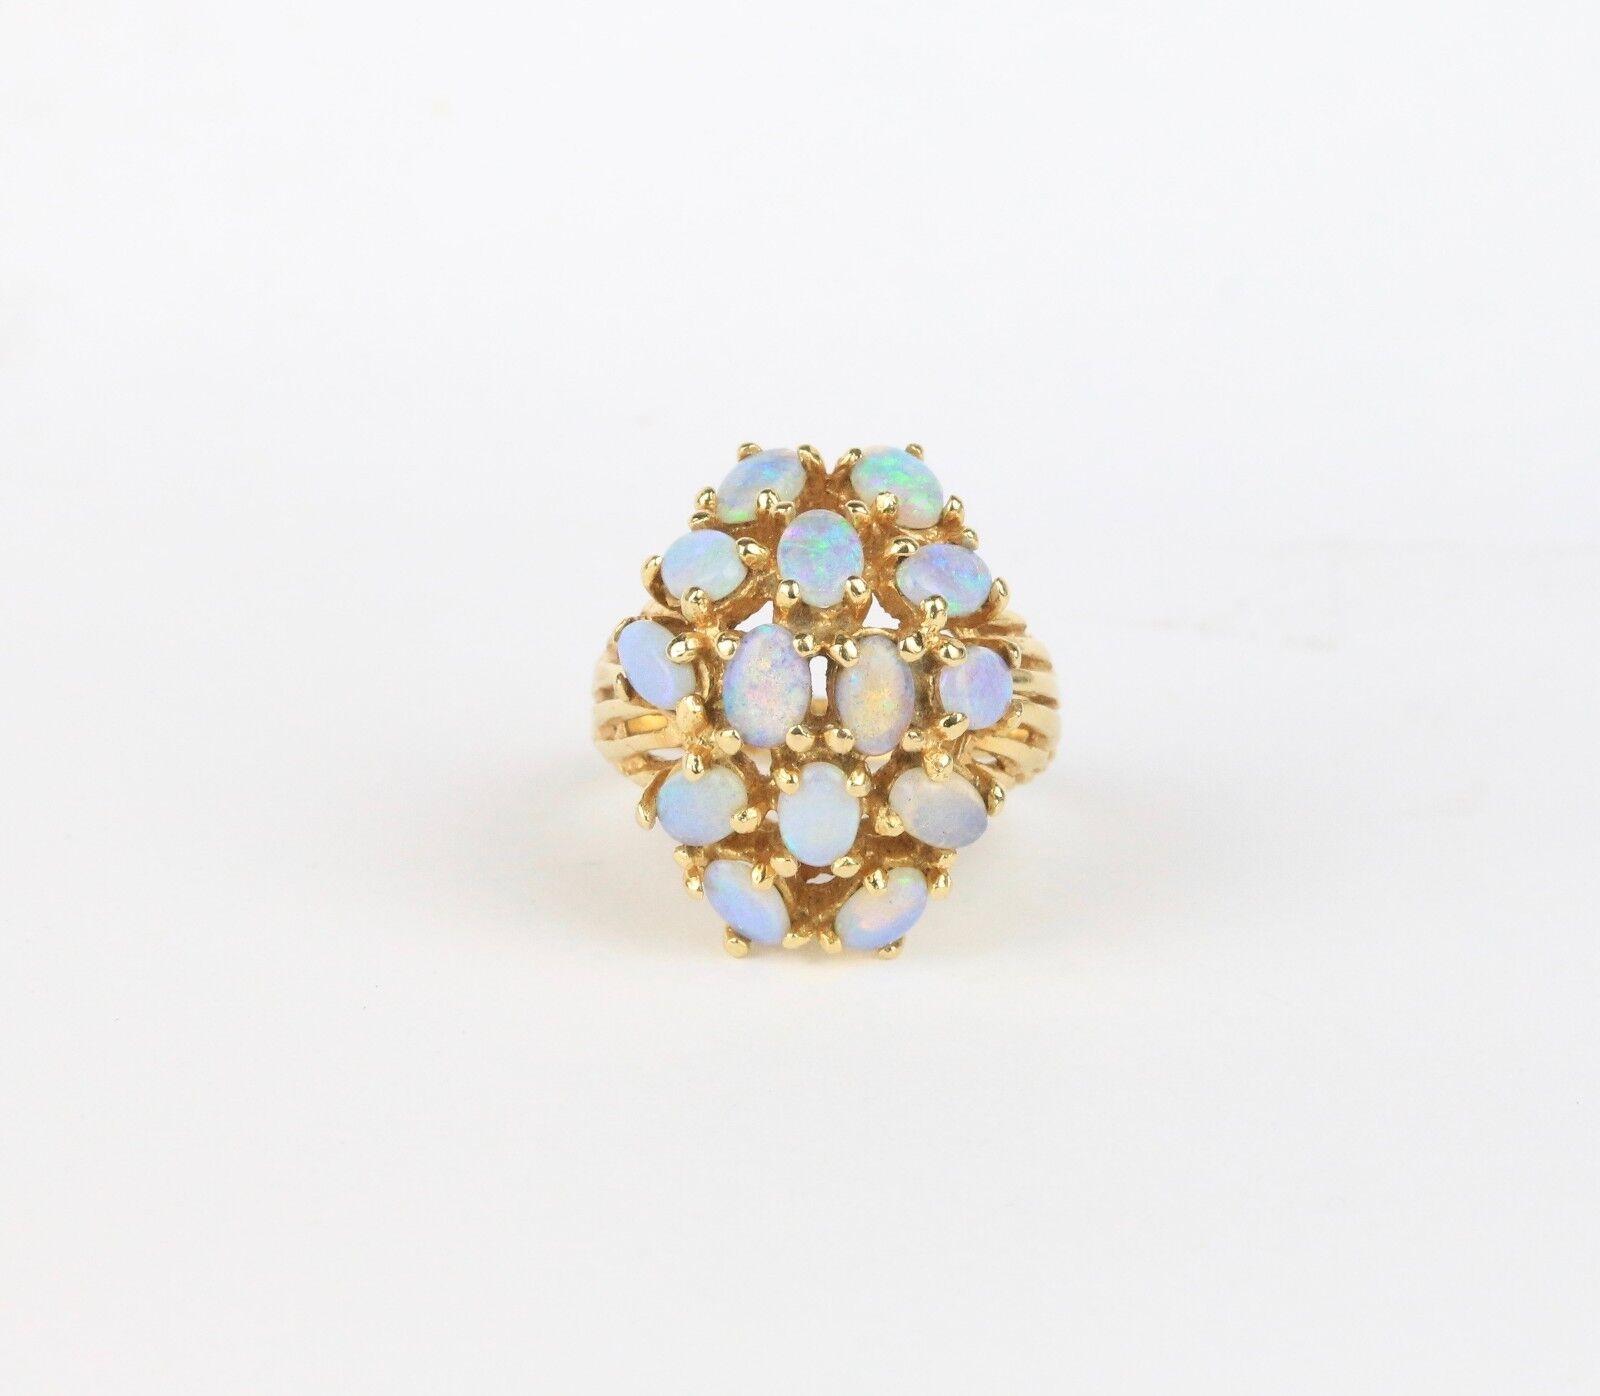 27f3086d7 Estate Opal Cluster 14K Ladies Ring nppapu13-Gemstone - fashion ...